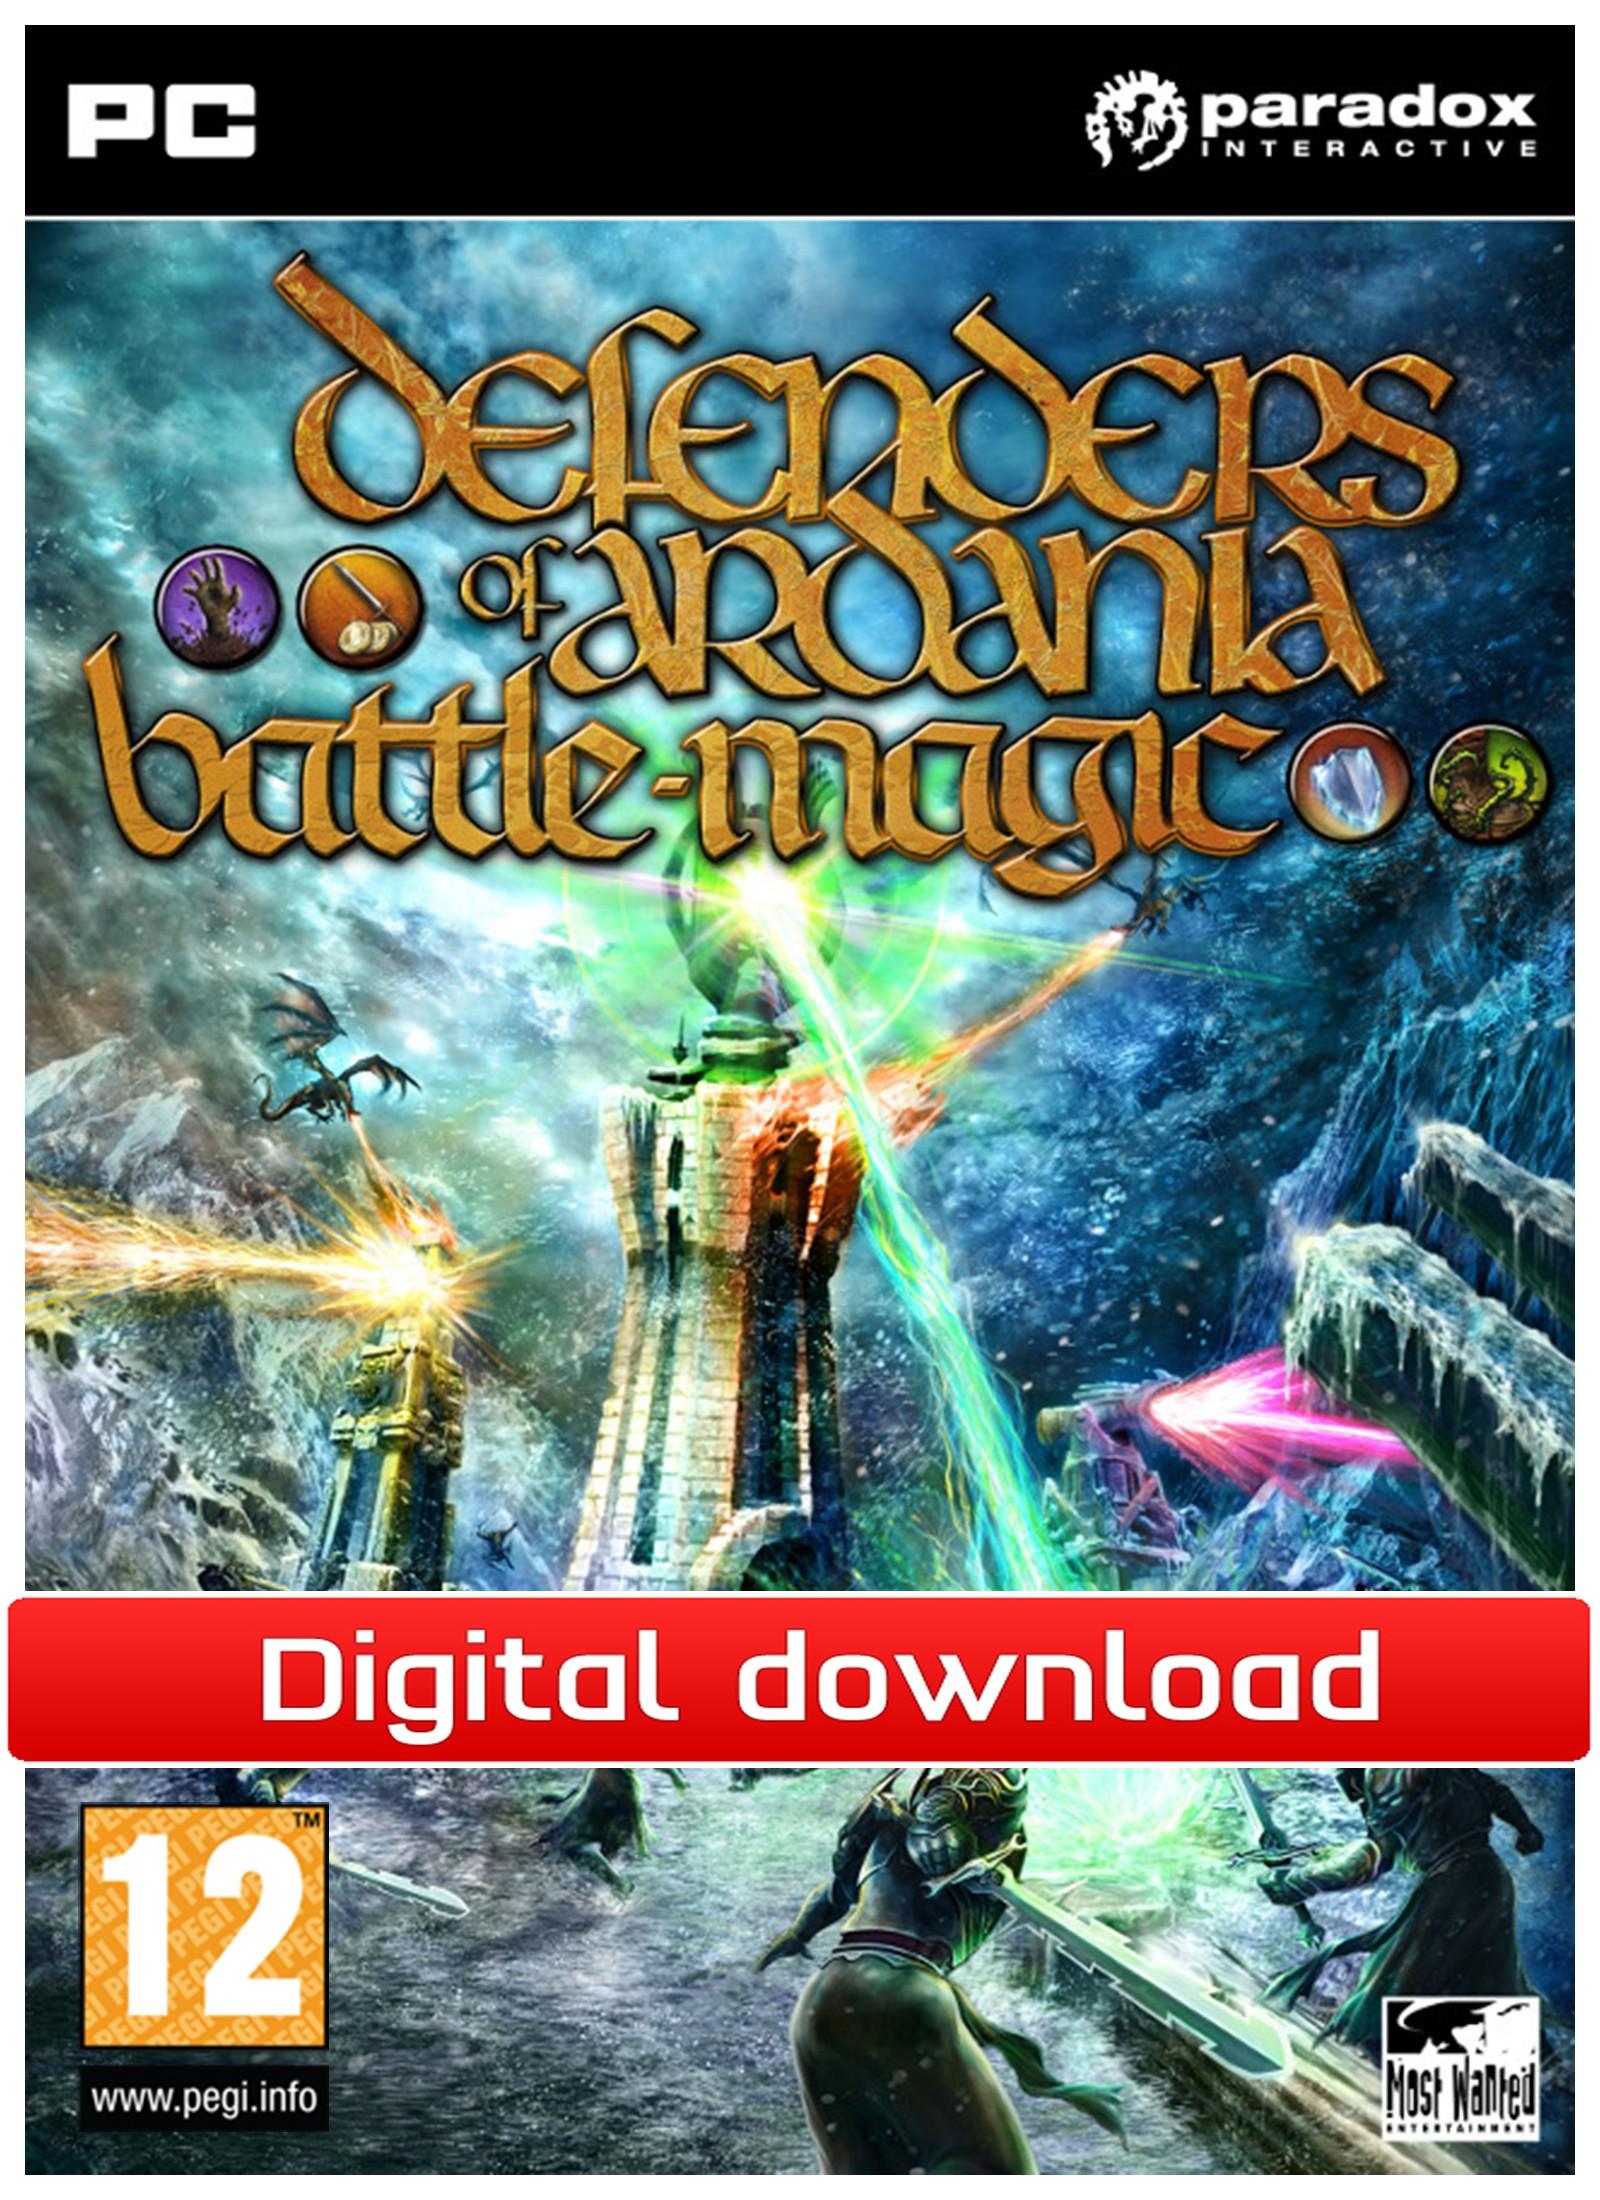 Defenders of Ardania: Battlemagic DLC (PC nedlastning) PCDD29500